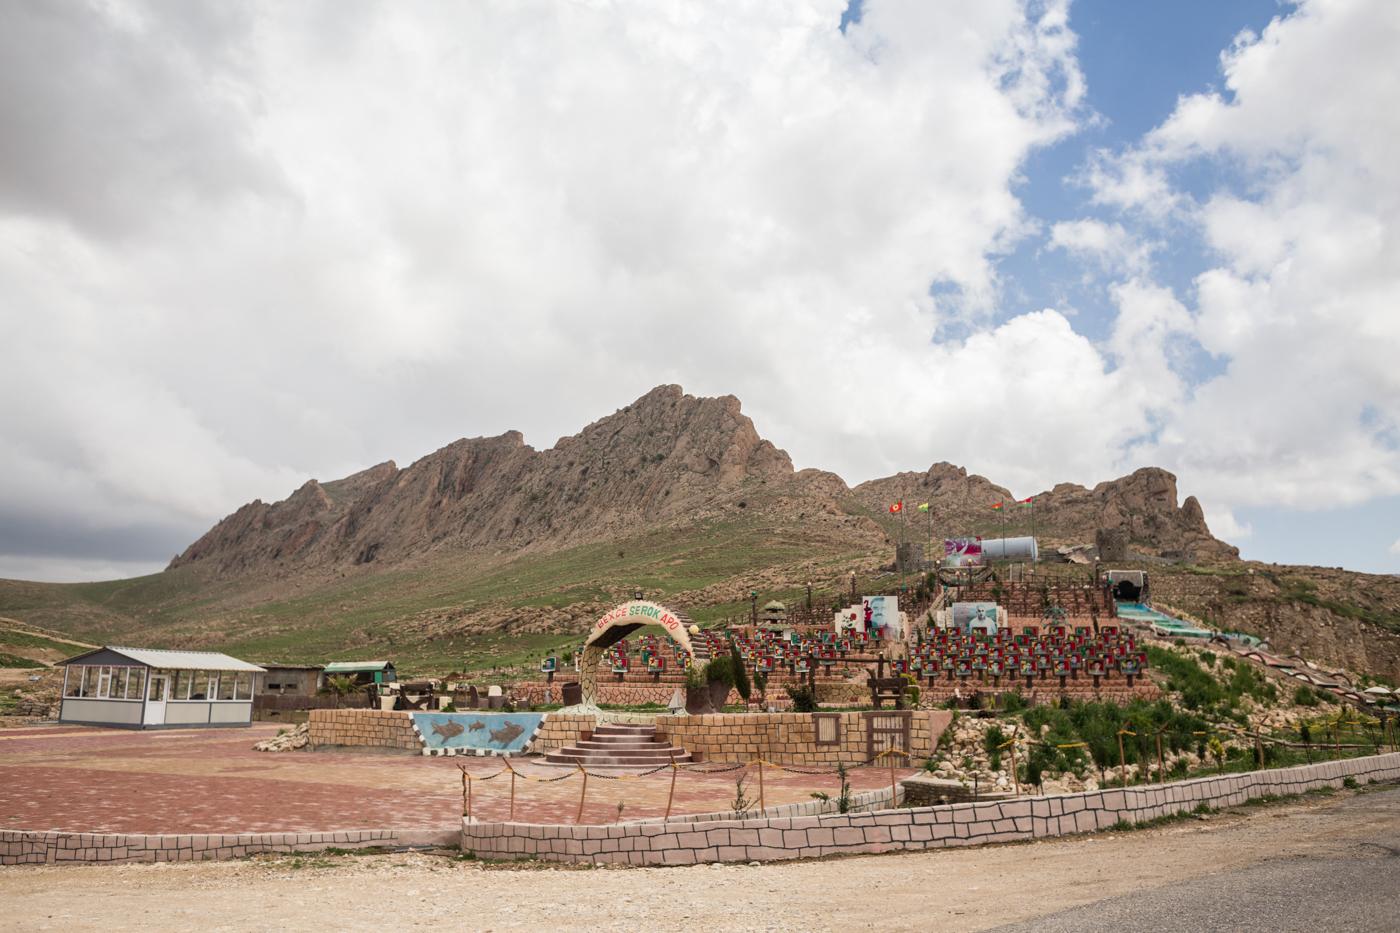 Giacomo_Sini_Italy_The_forgotten_people_of_Kurdistan_20.jpg